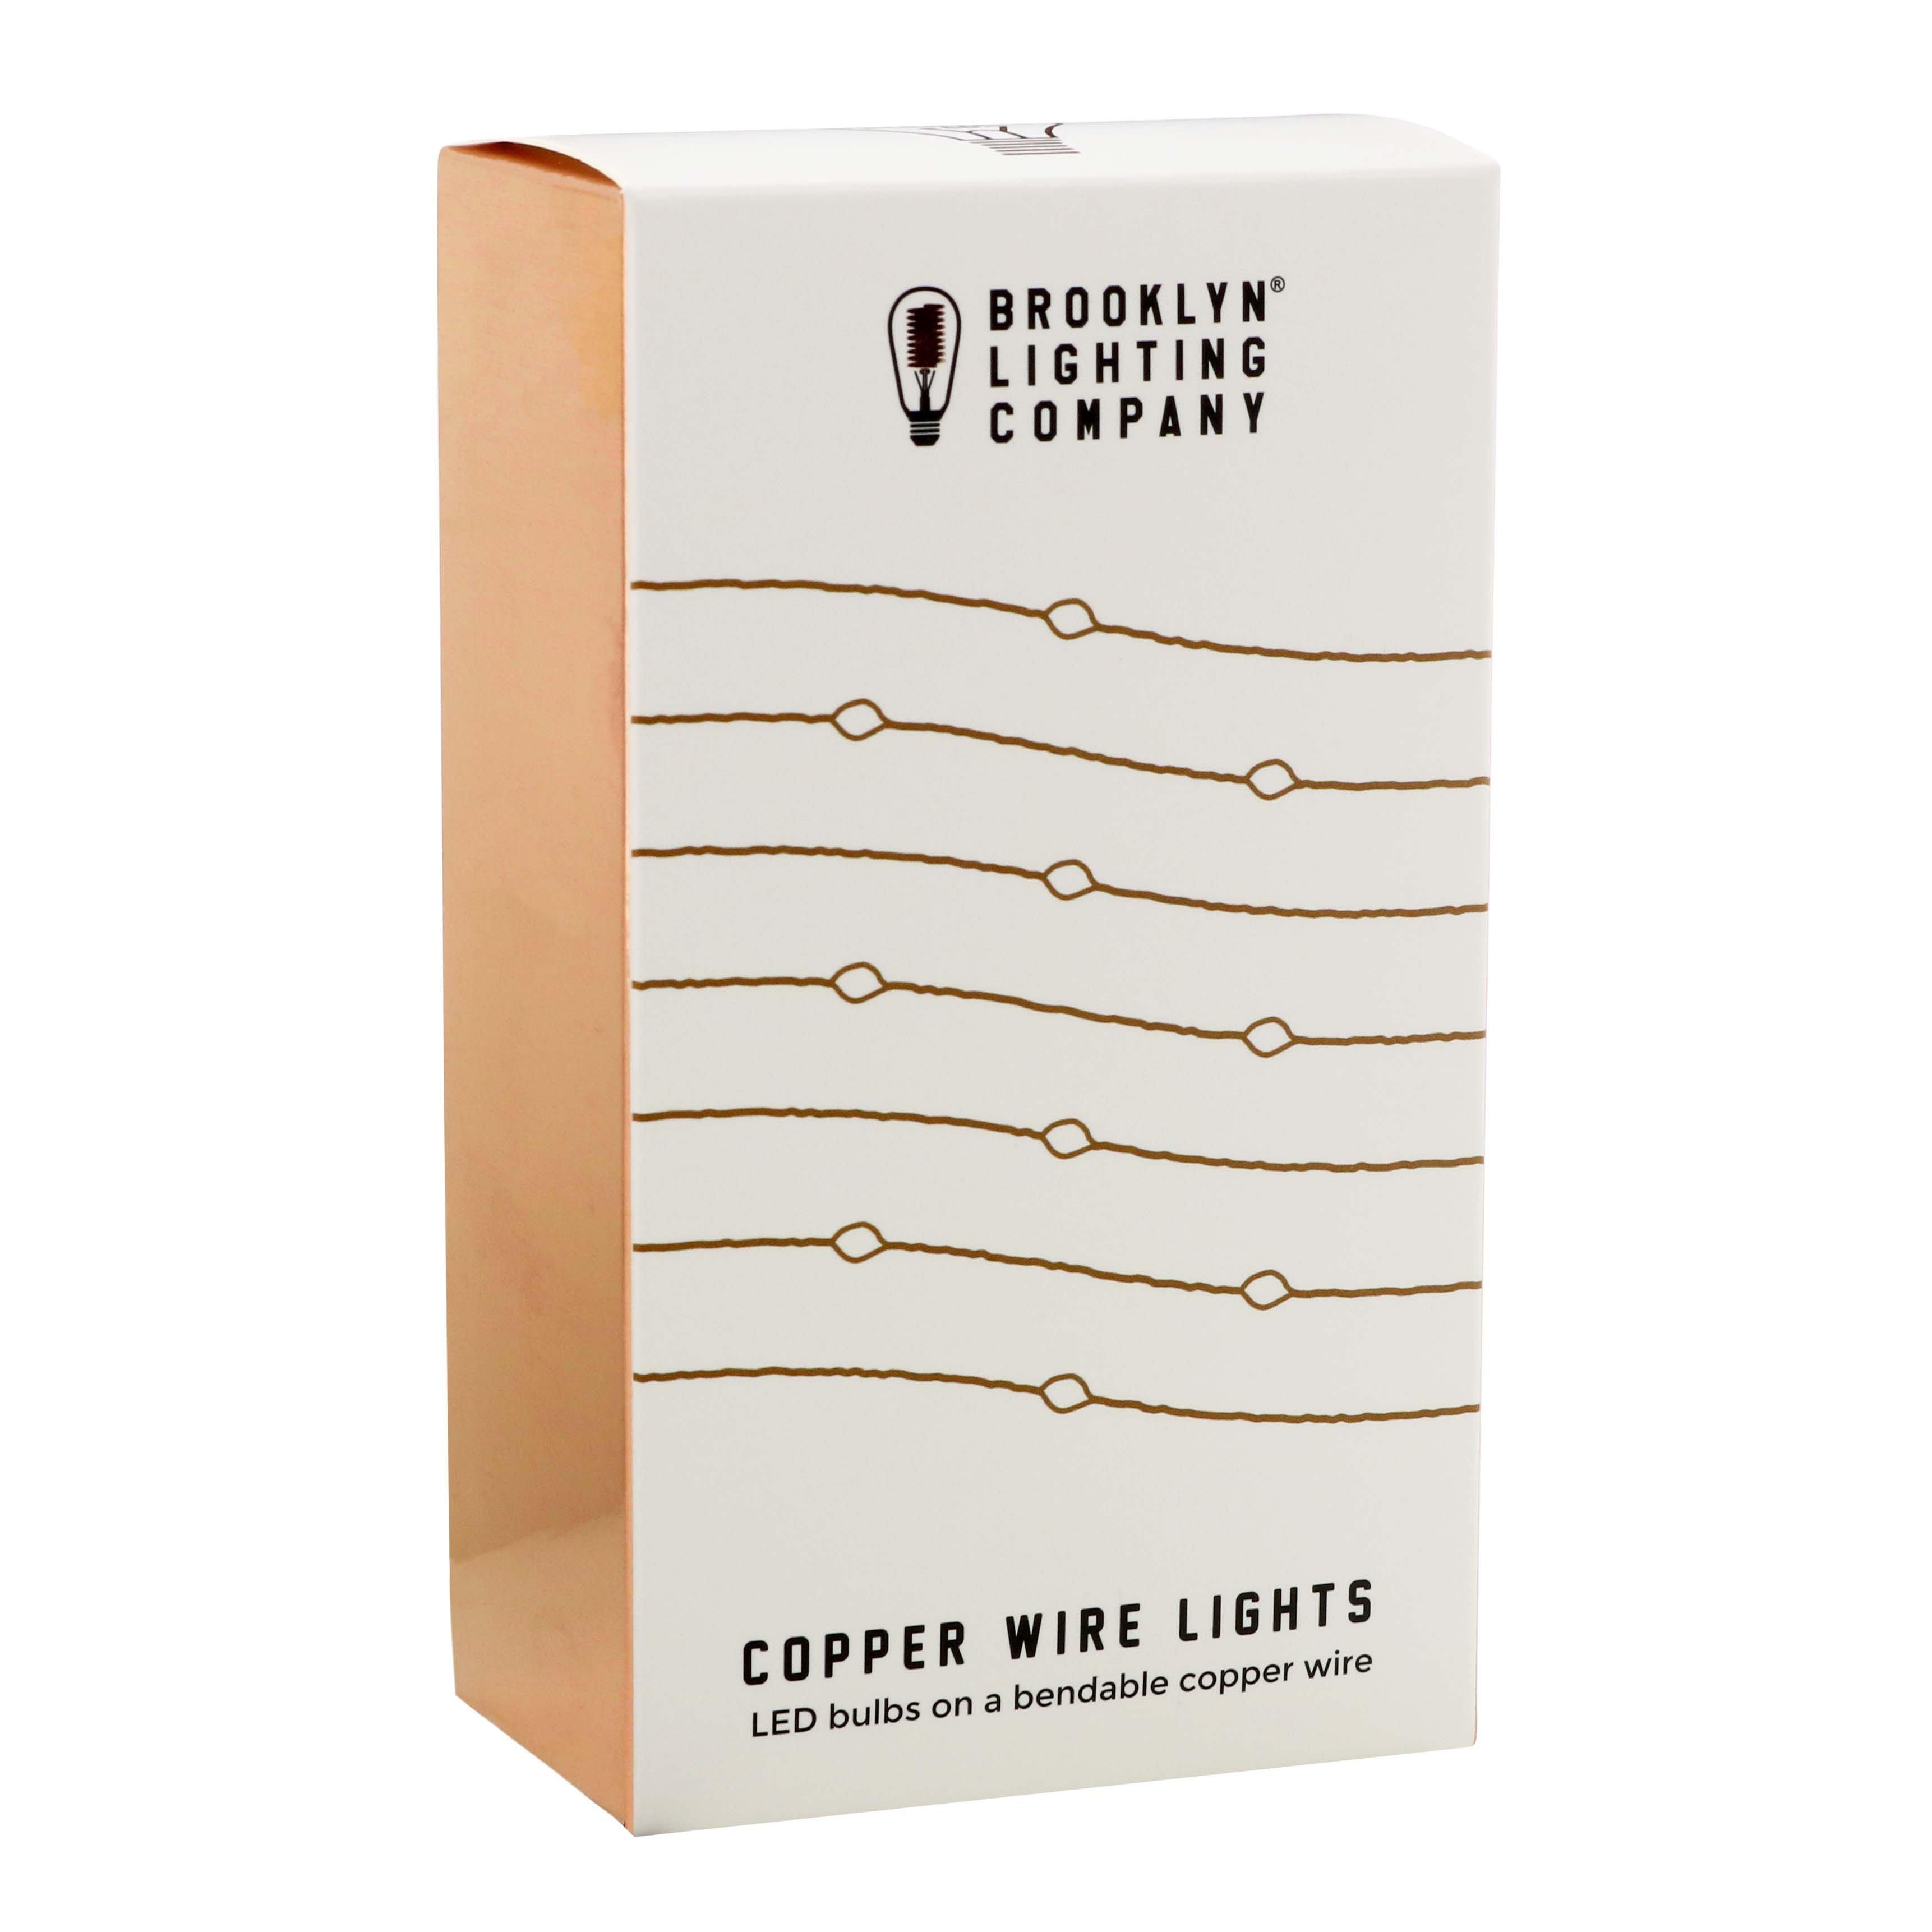 Brooklyn Lighting Company Copper Wire Lights